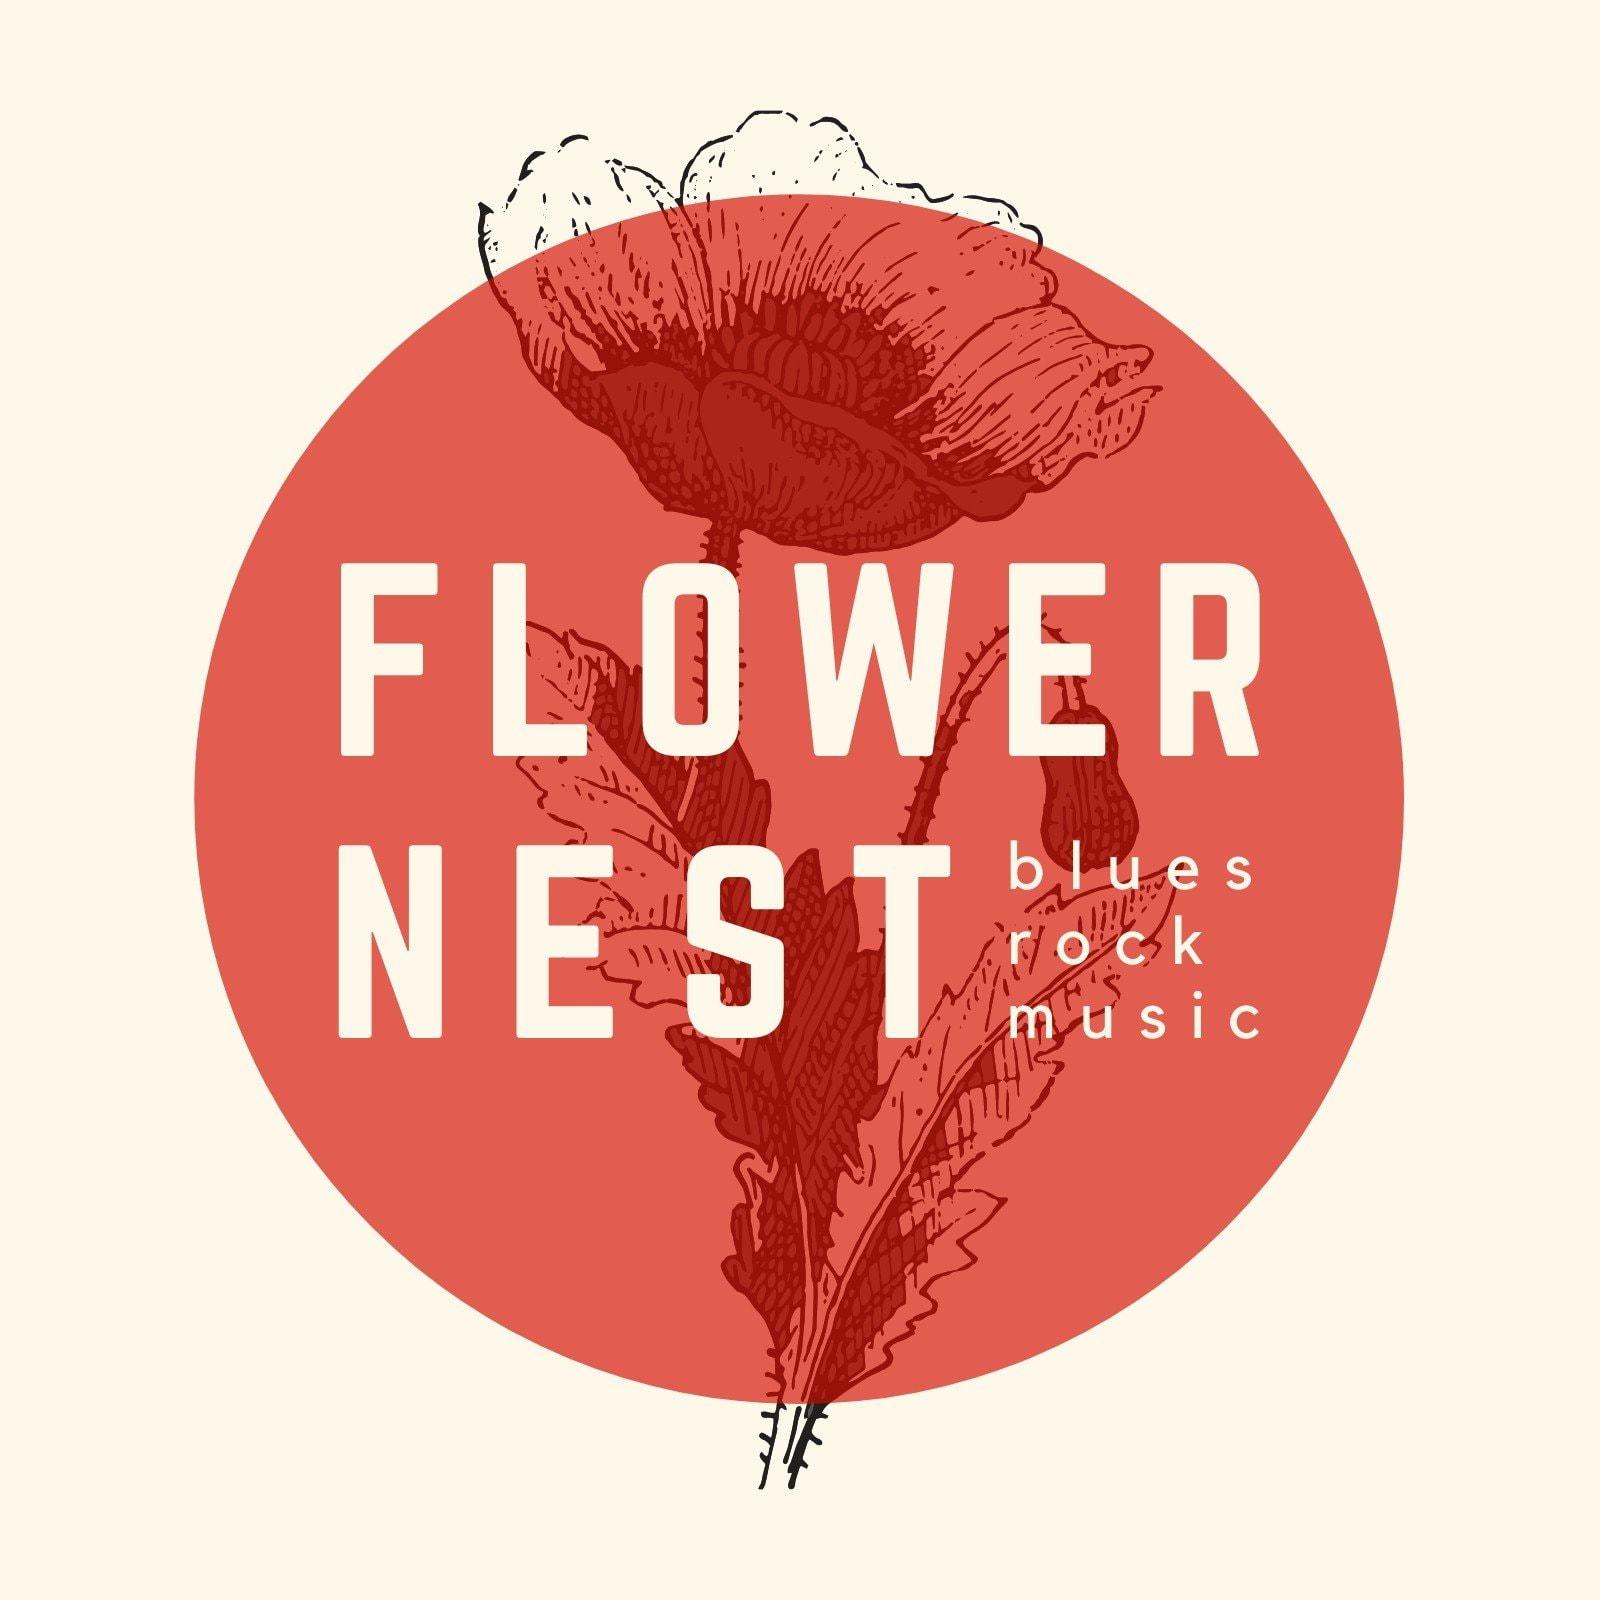 Floral Illustration CD Cover (Album Cover)